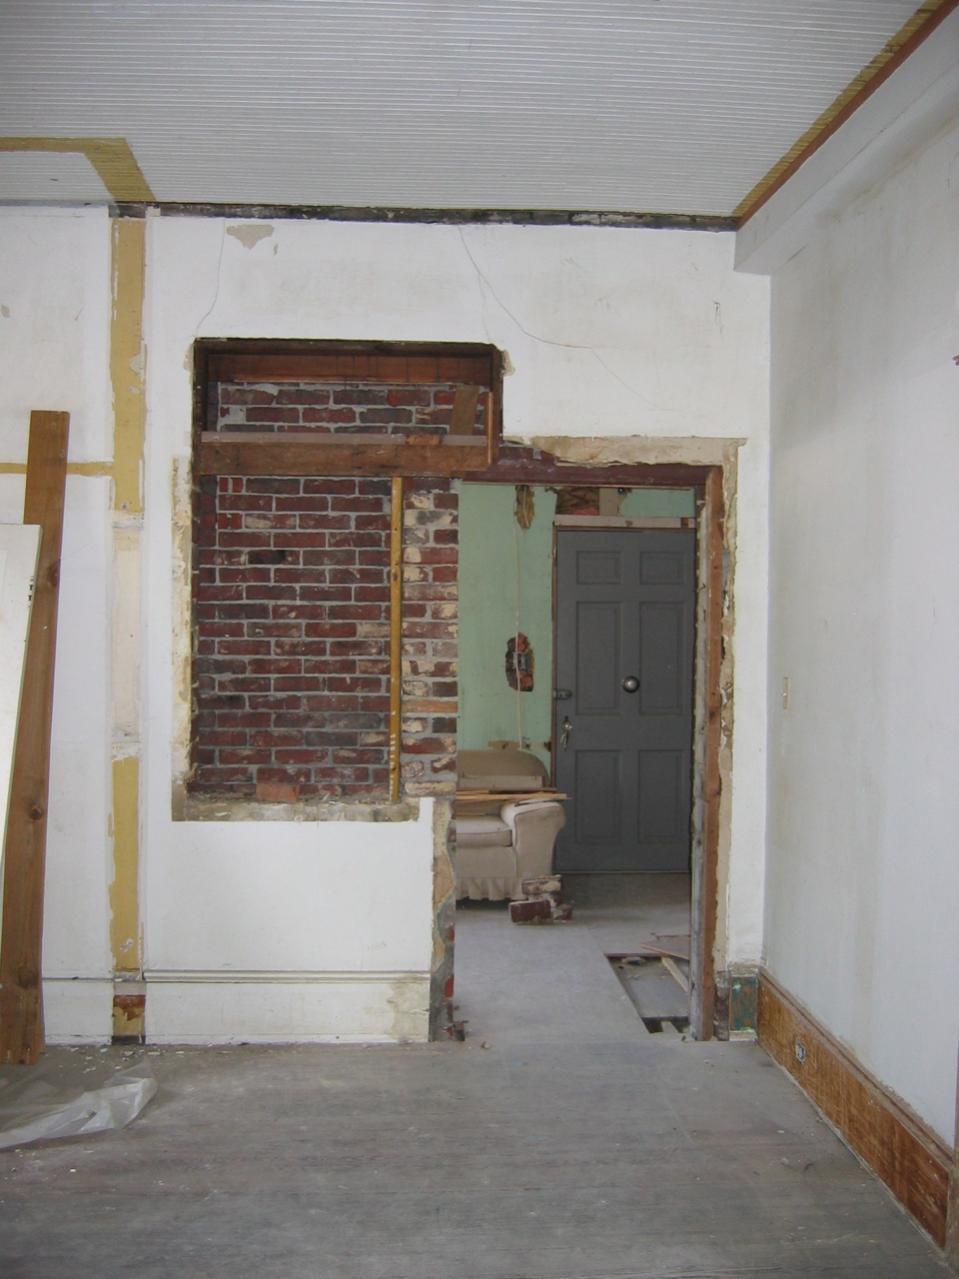 removing doorway from solid masonry wall-img_2946.jpg